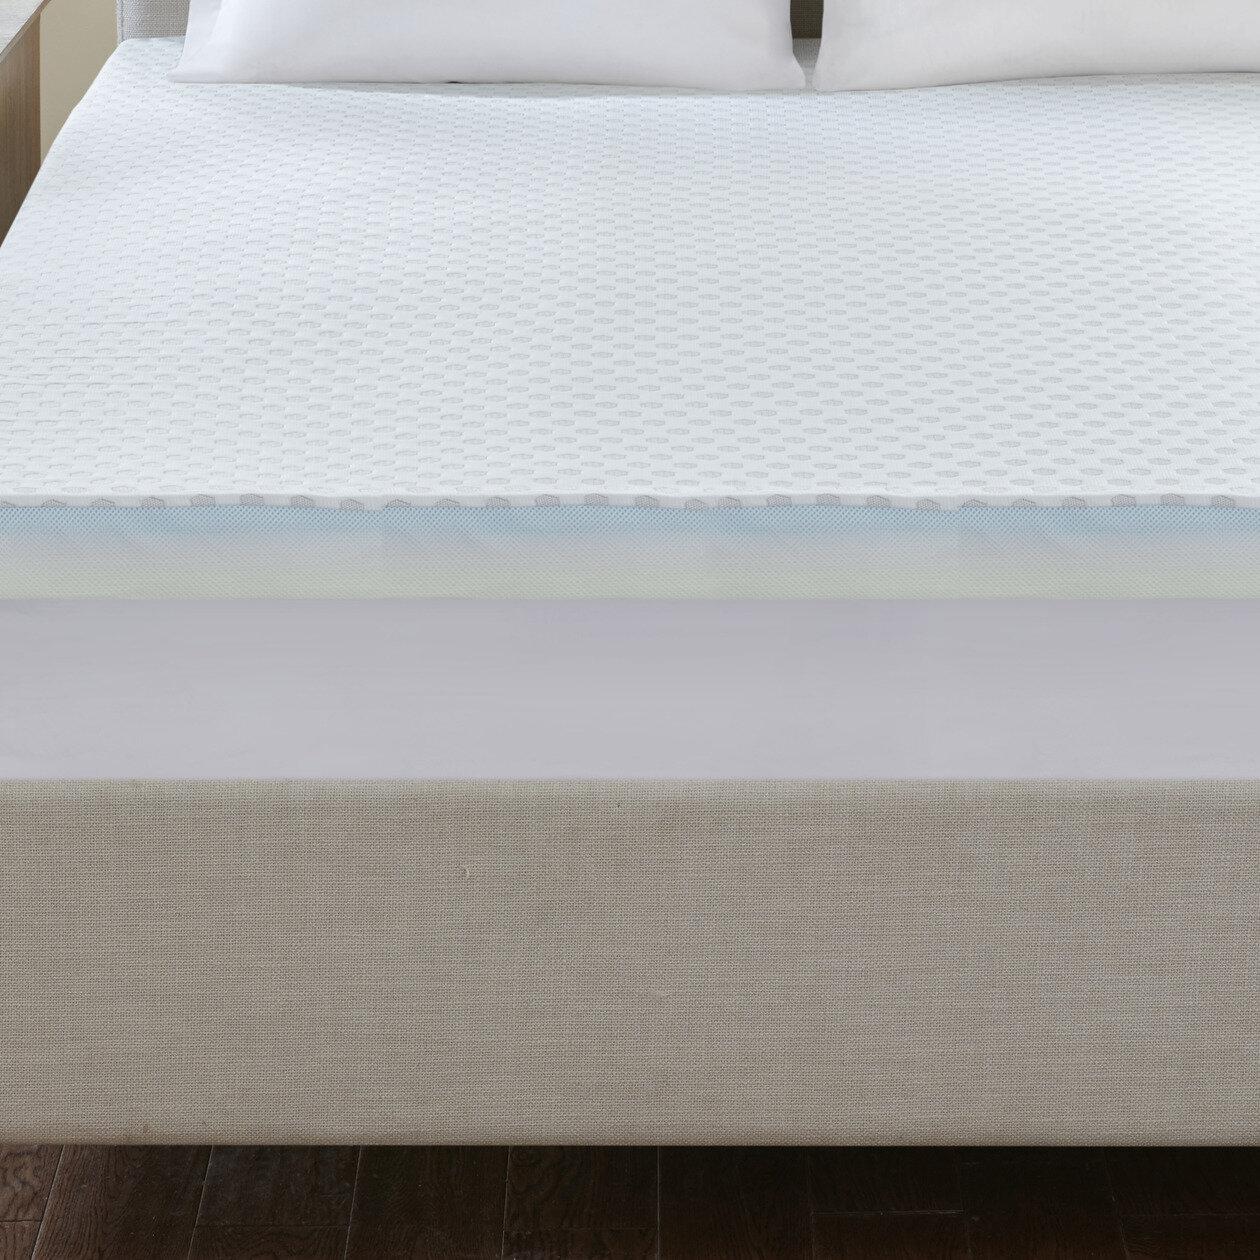 Alwyn Home Lucrezia Cooling To Warming Reversible 3 Gel Memory Foam